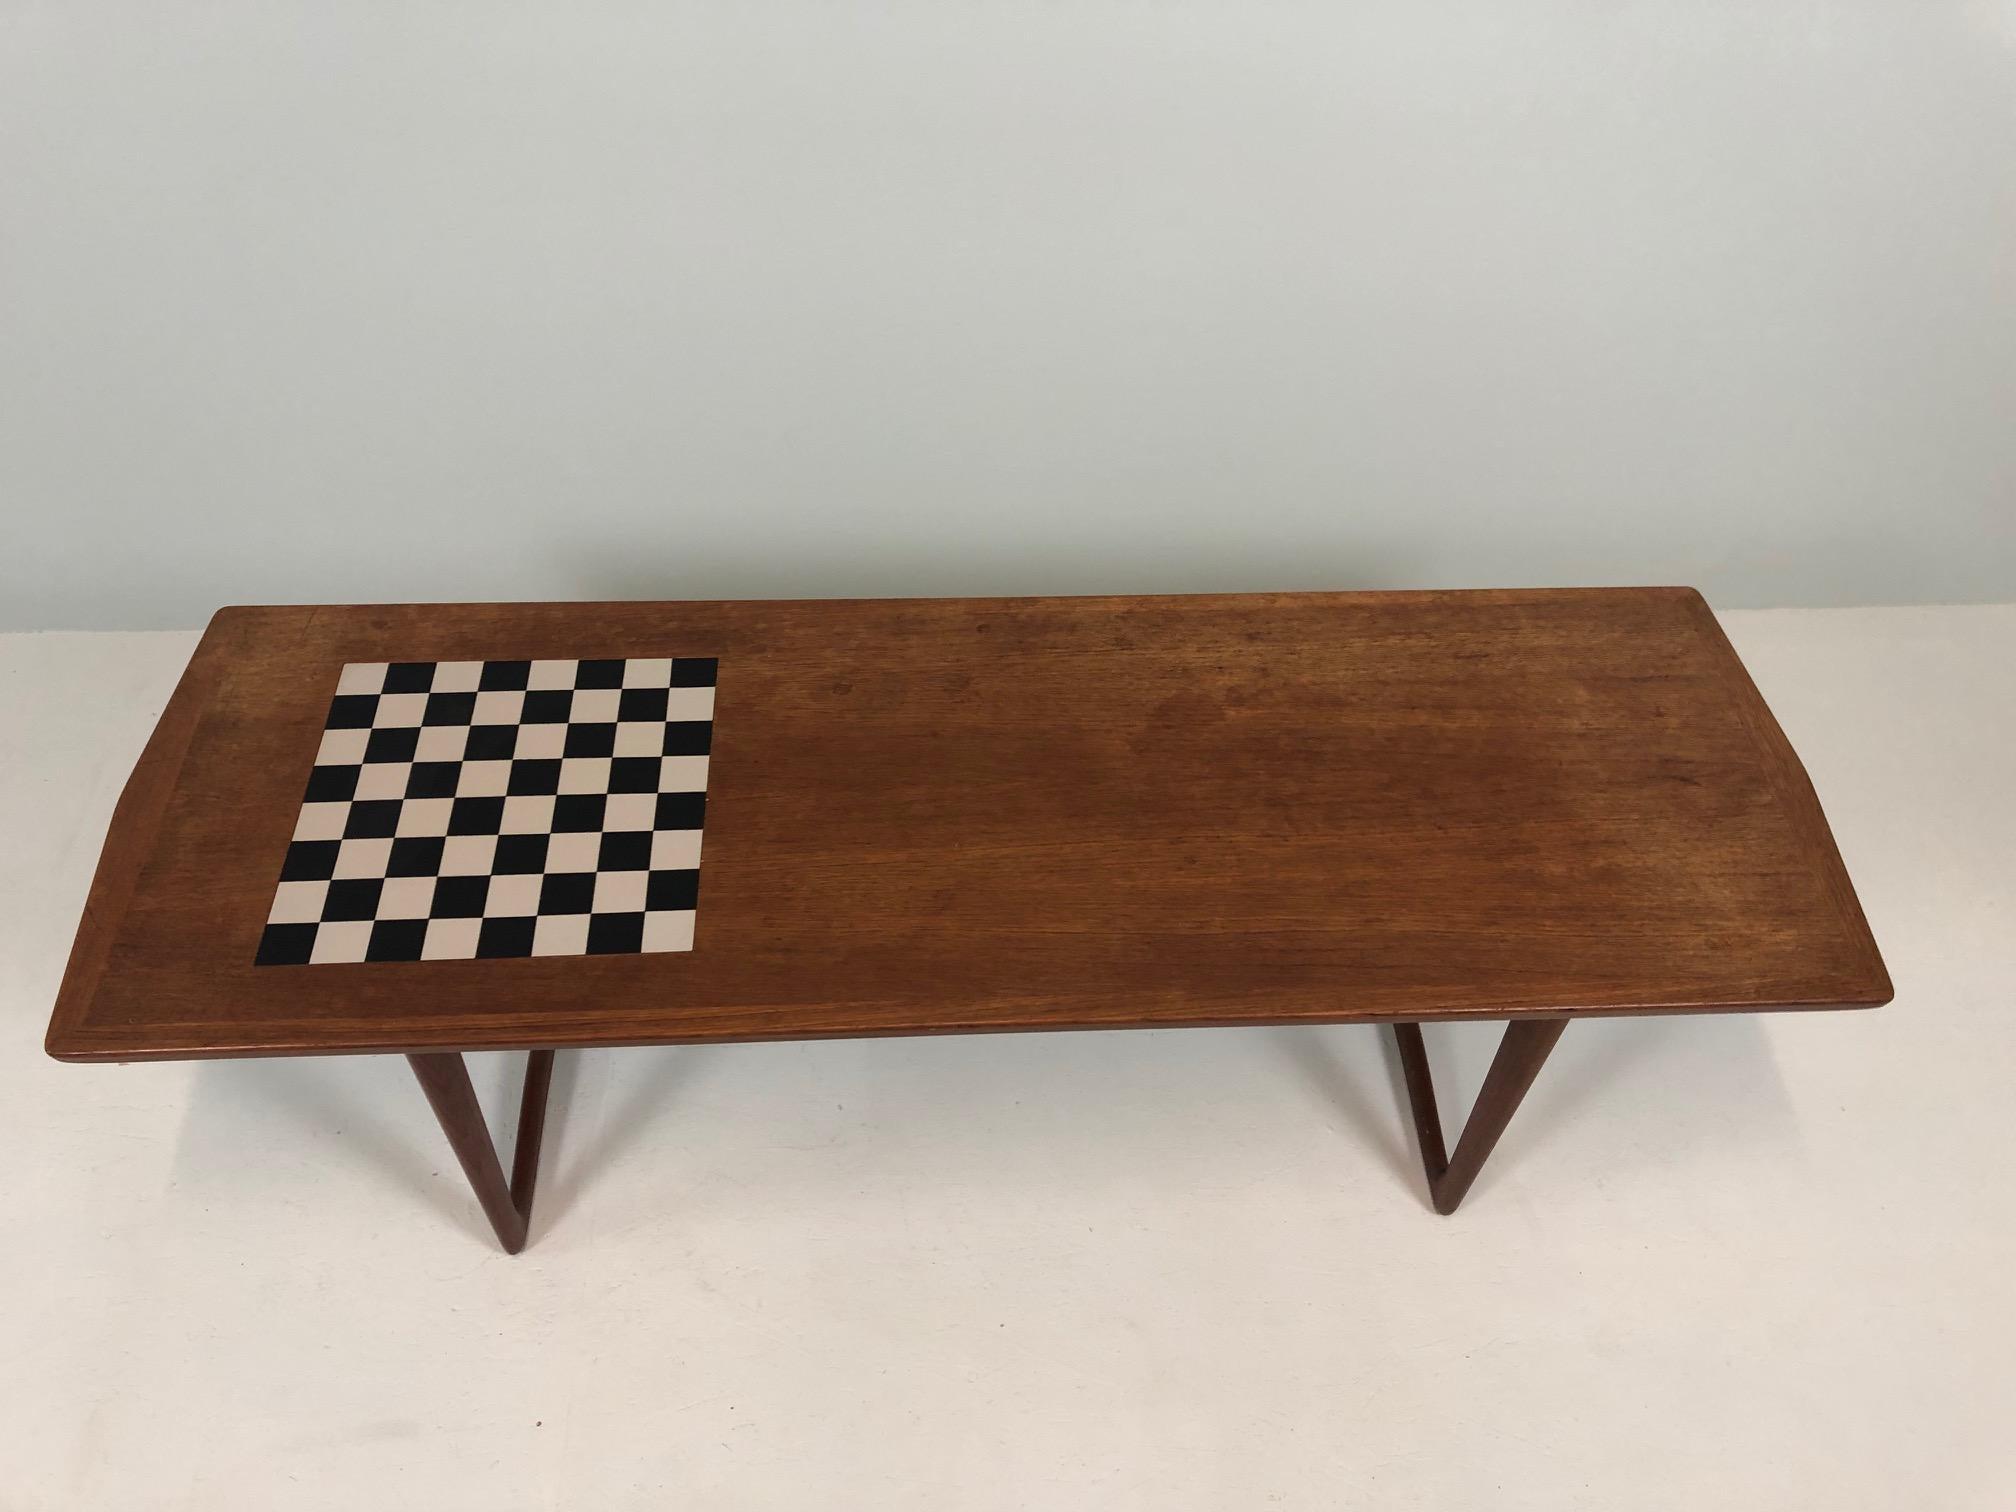 Teak Coffee Table 1960s Danish With Chessboard